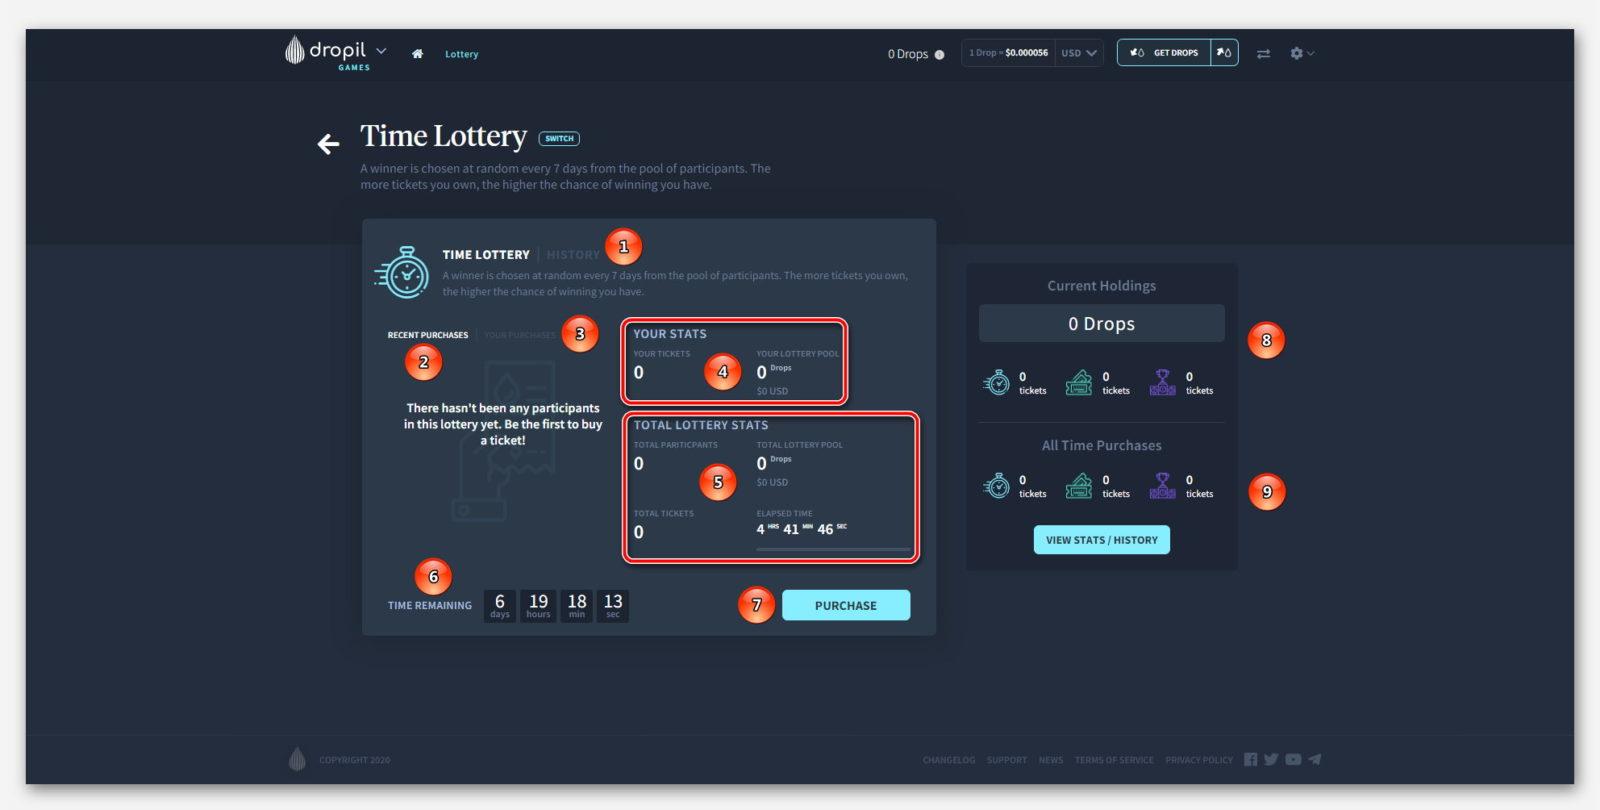 Time Lottery в проекте Dropil Games от компании Dropil